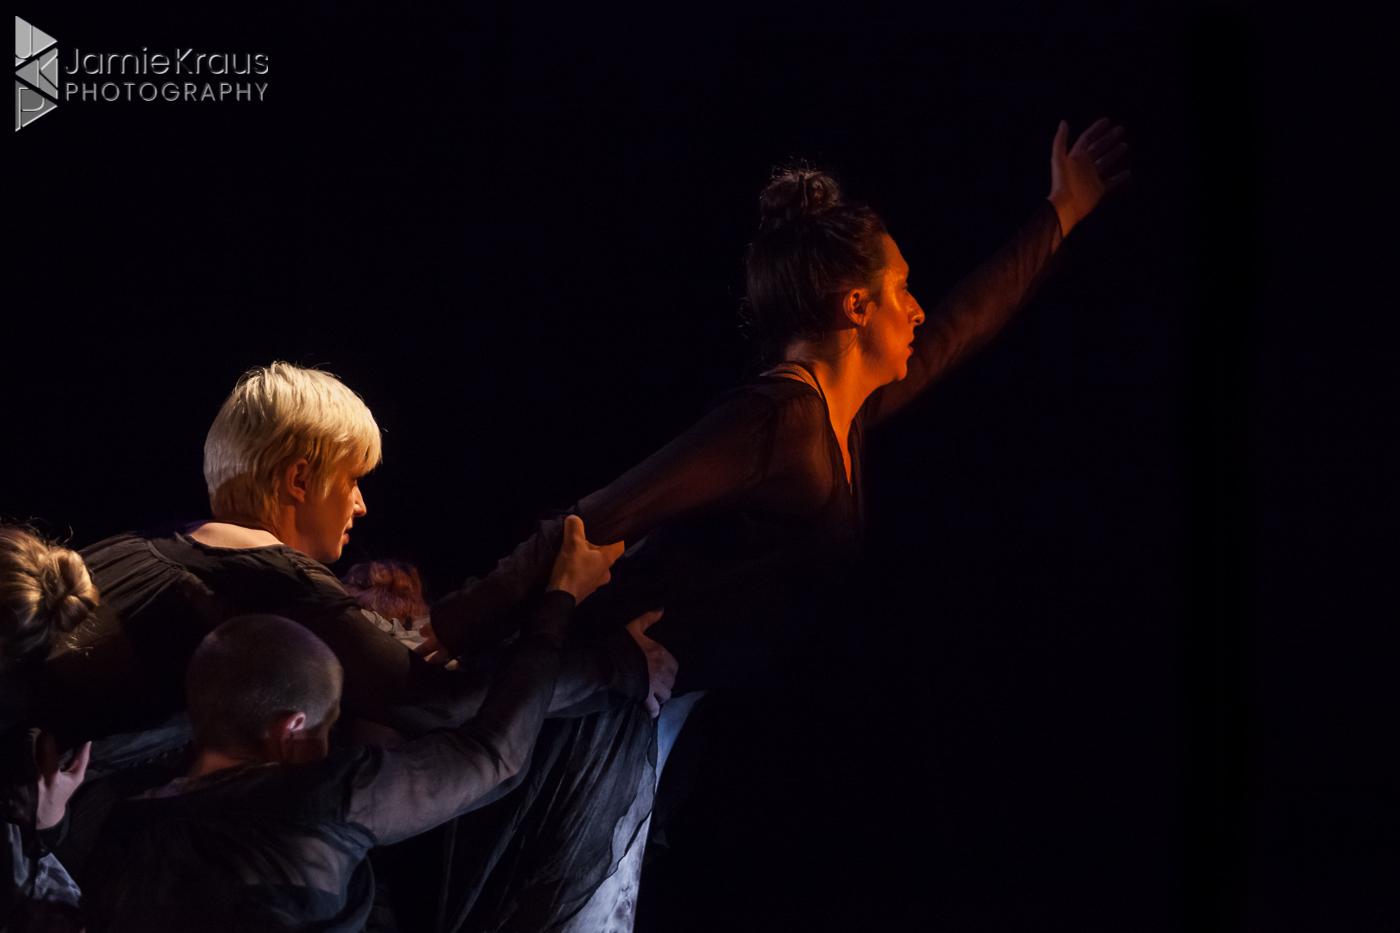 denver performing arts photographer